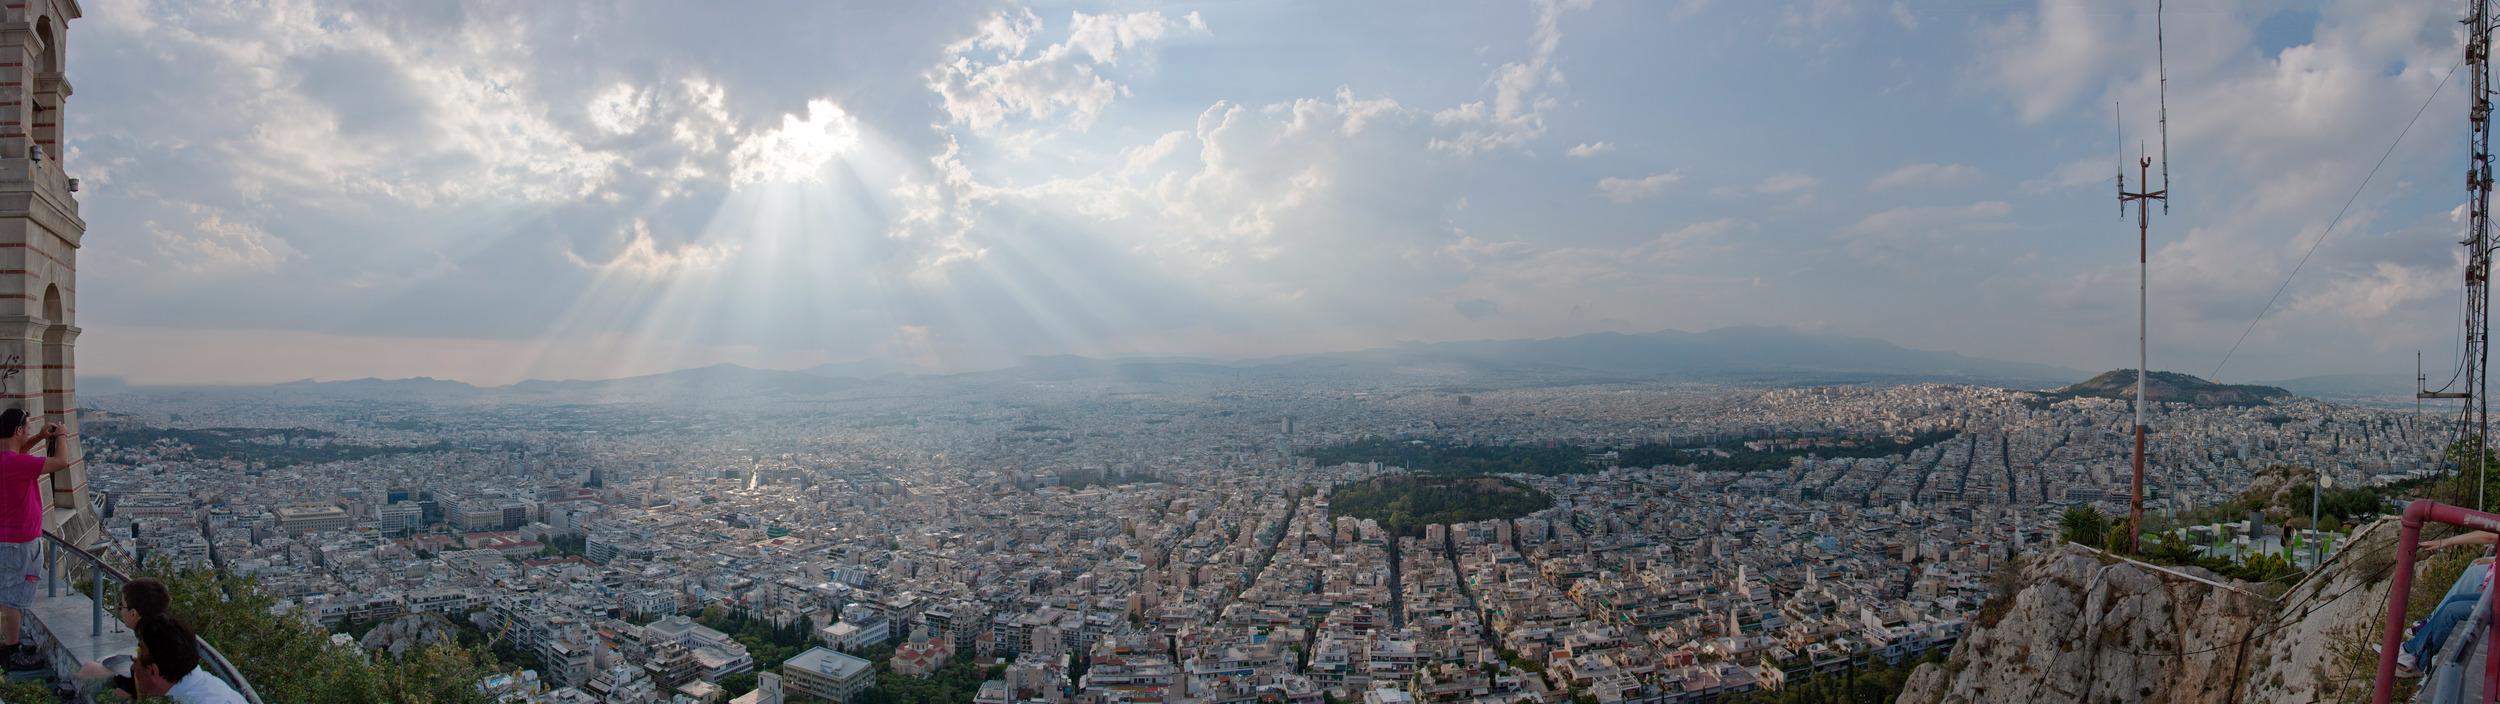 View from Lykavittos